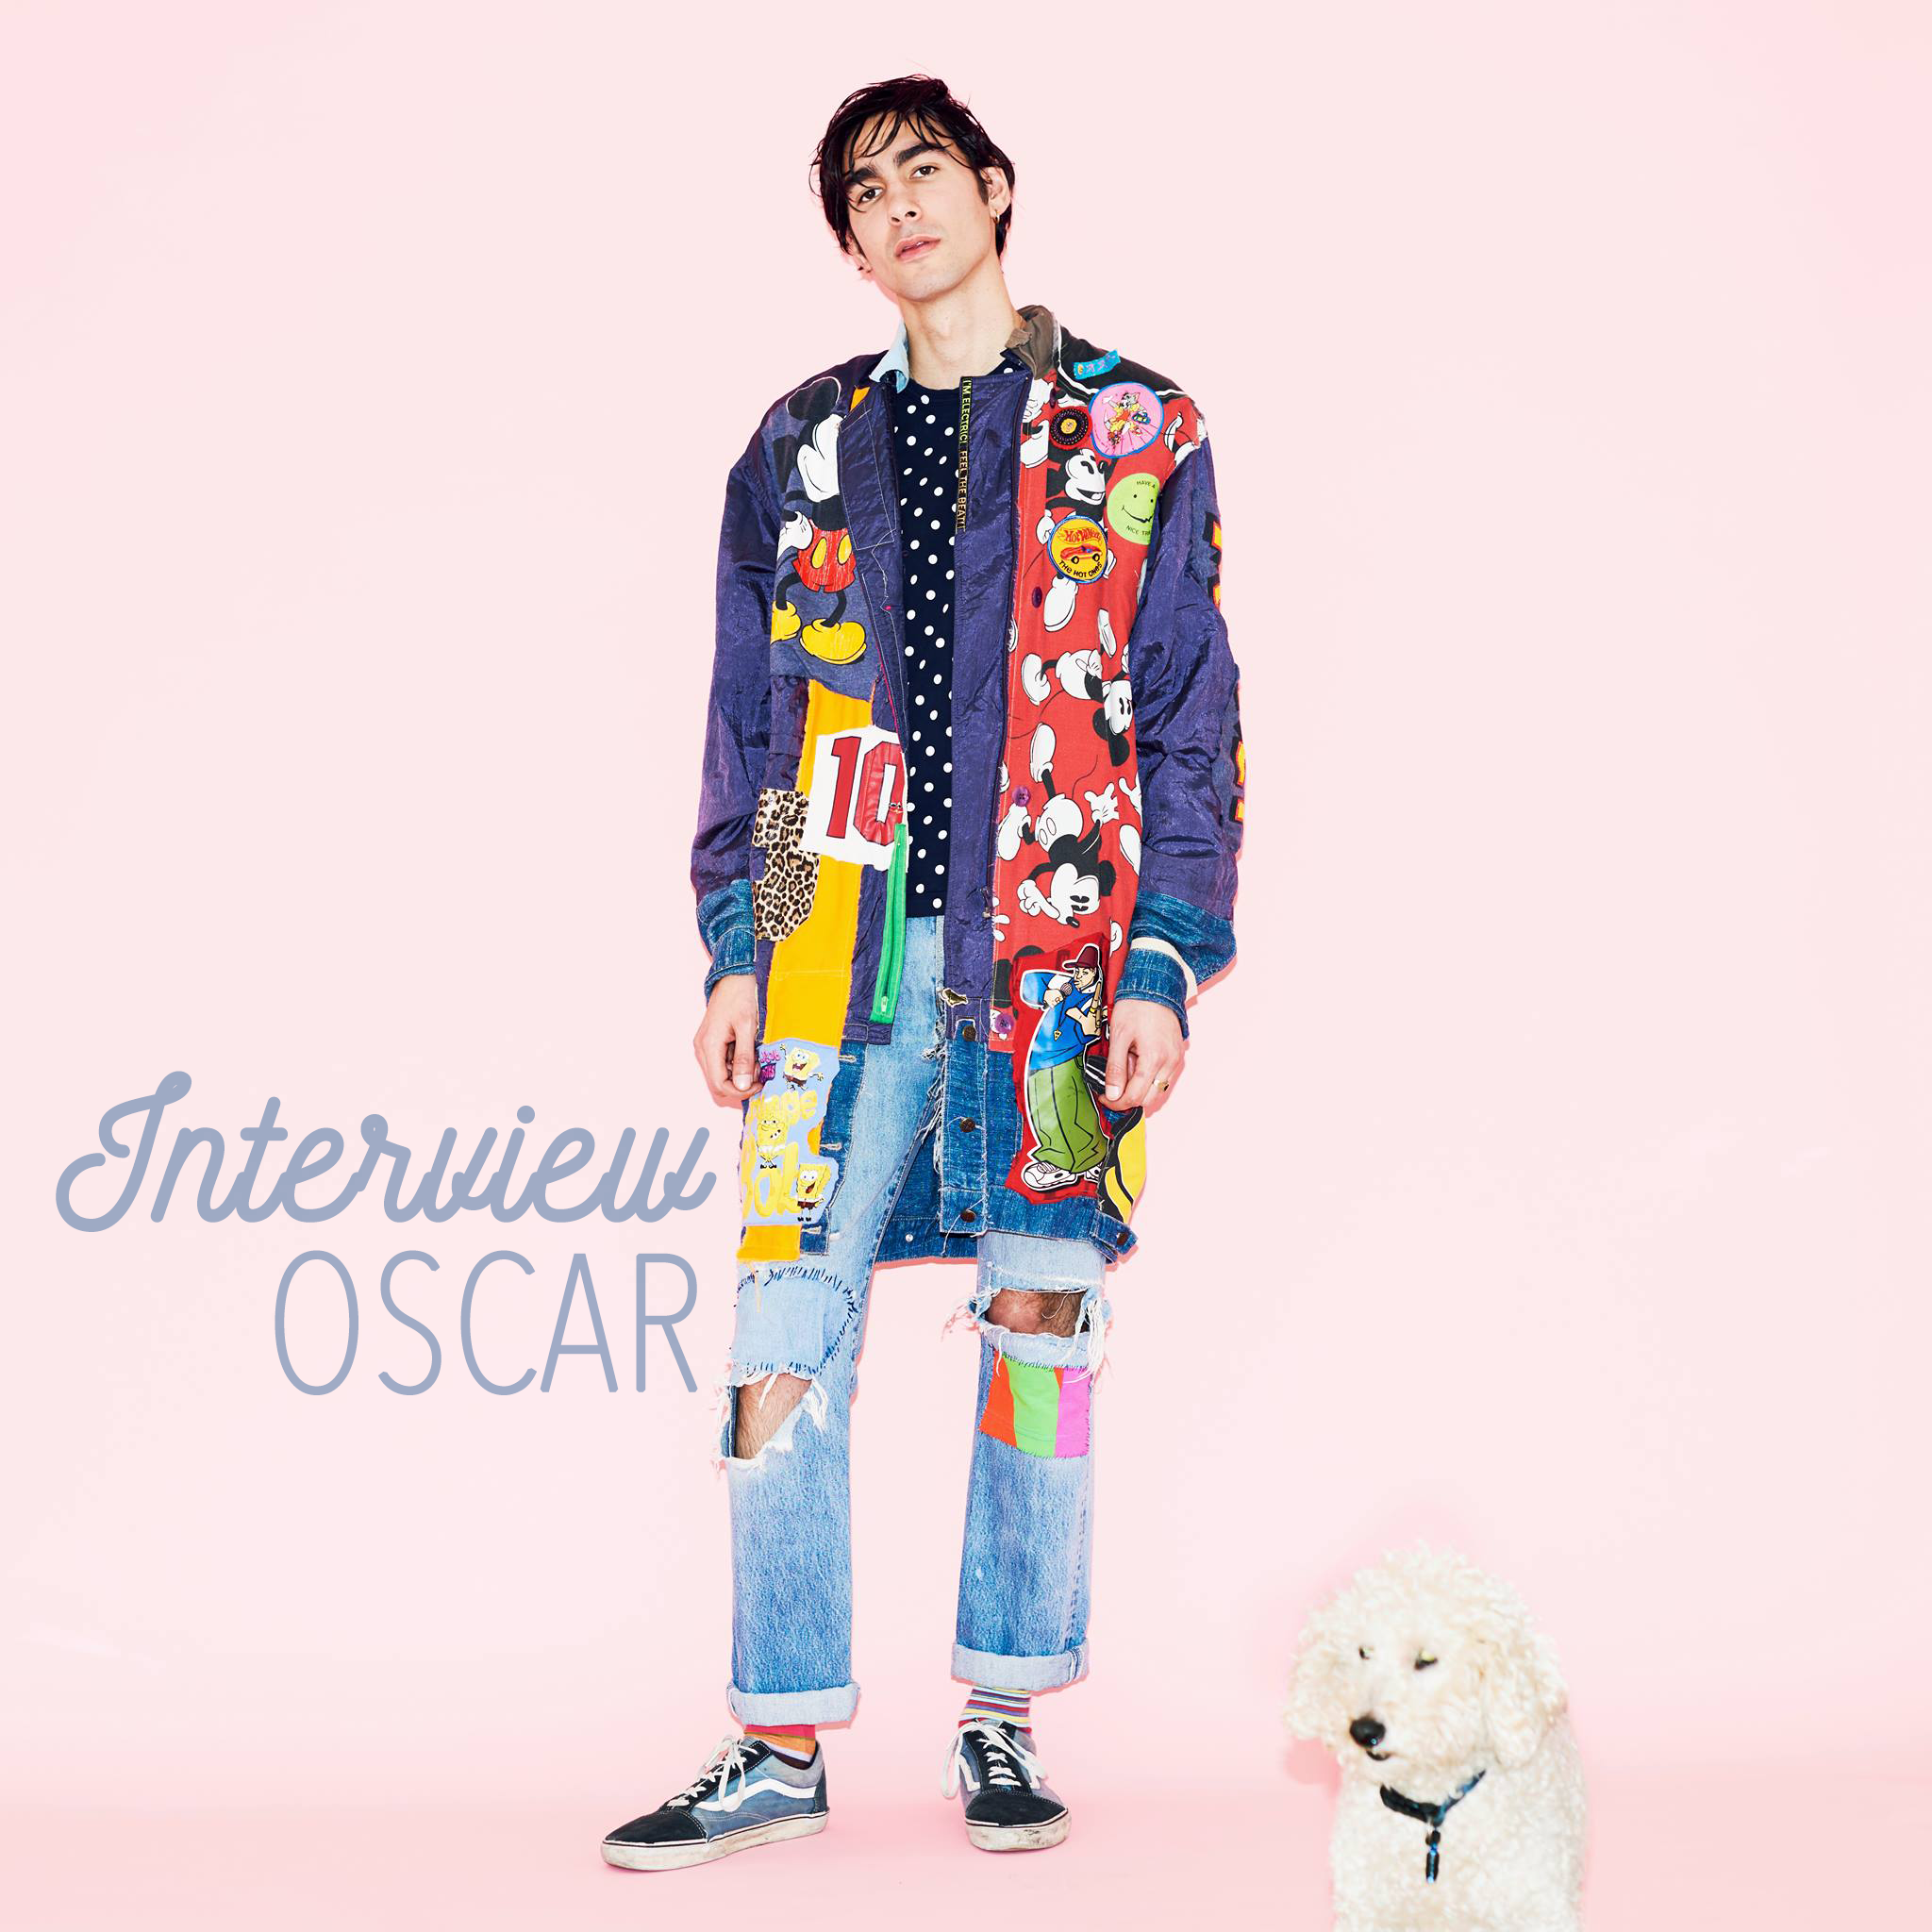 interview oscar